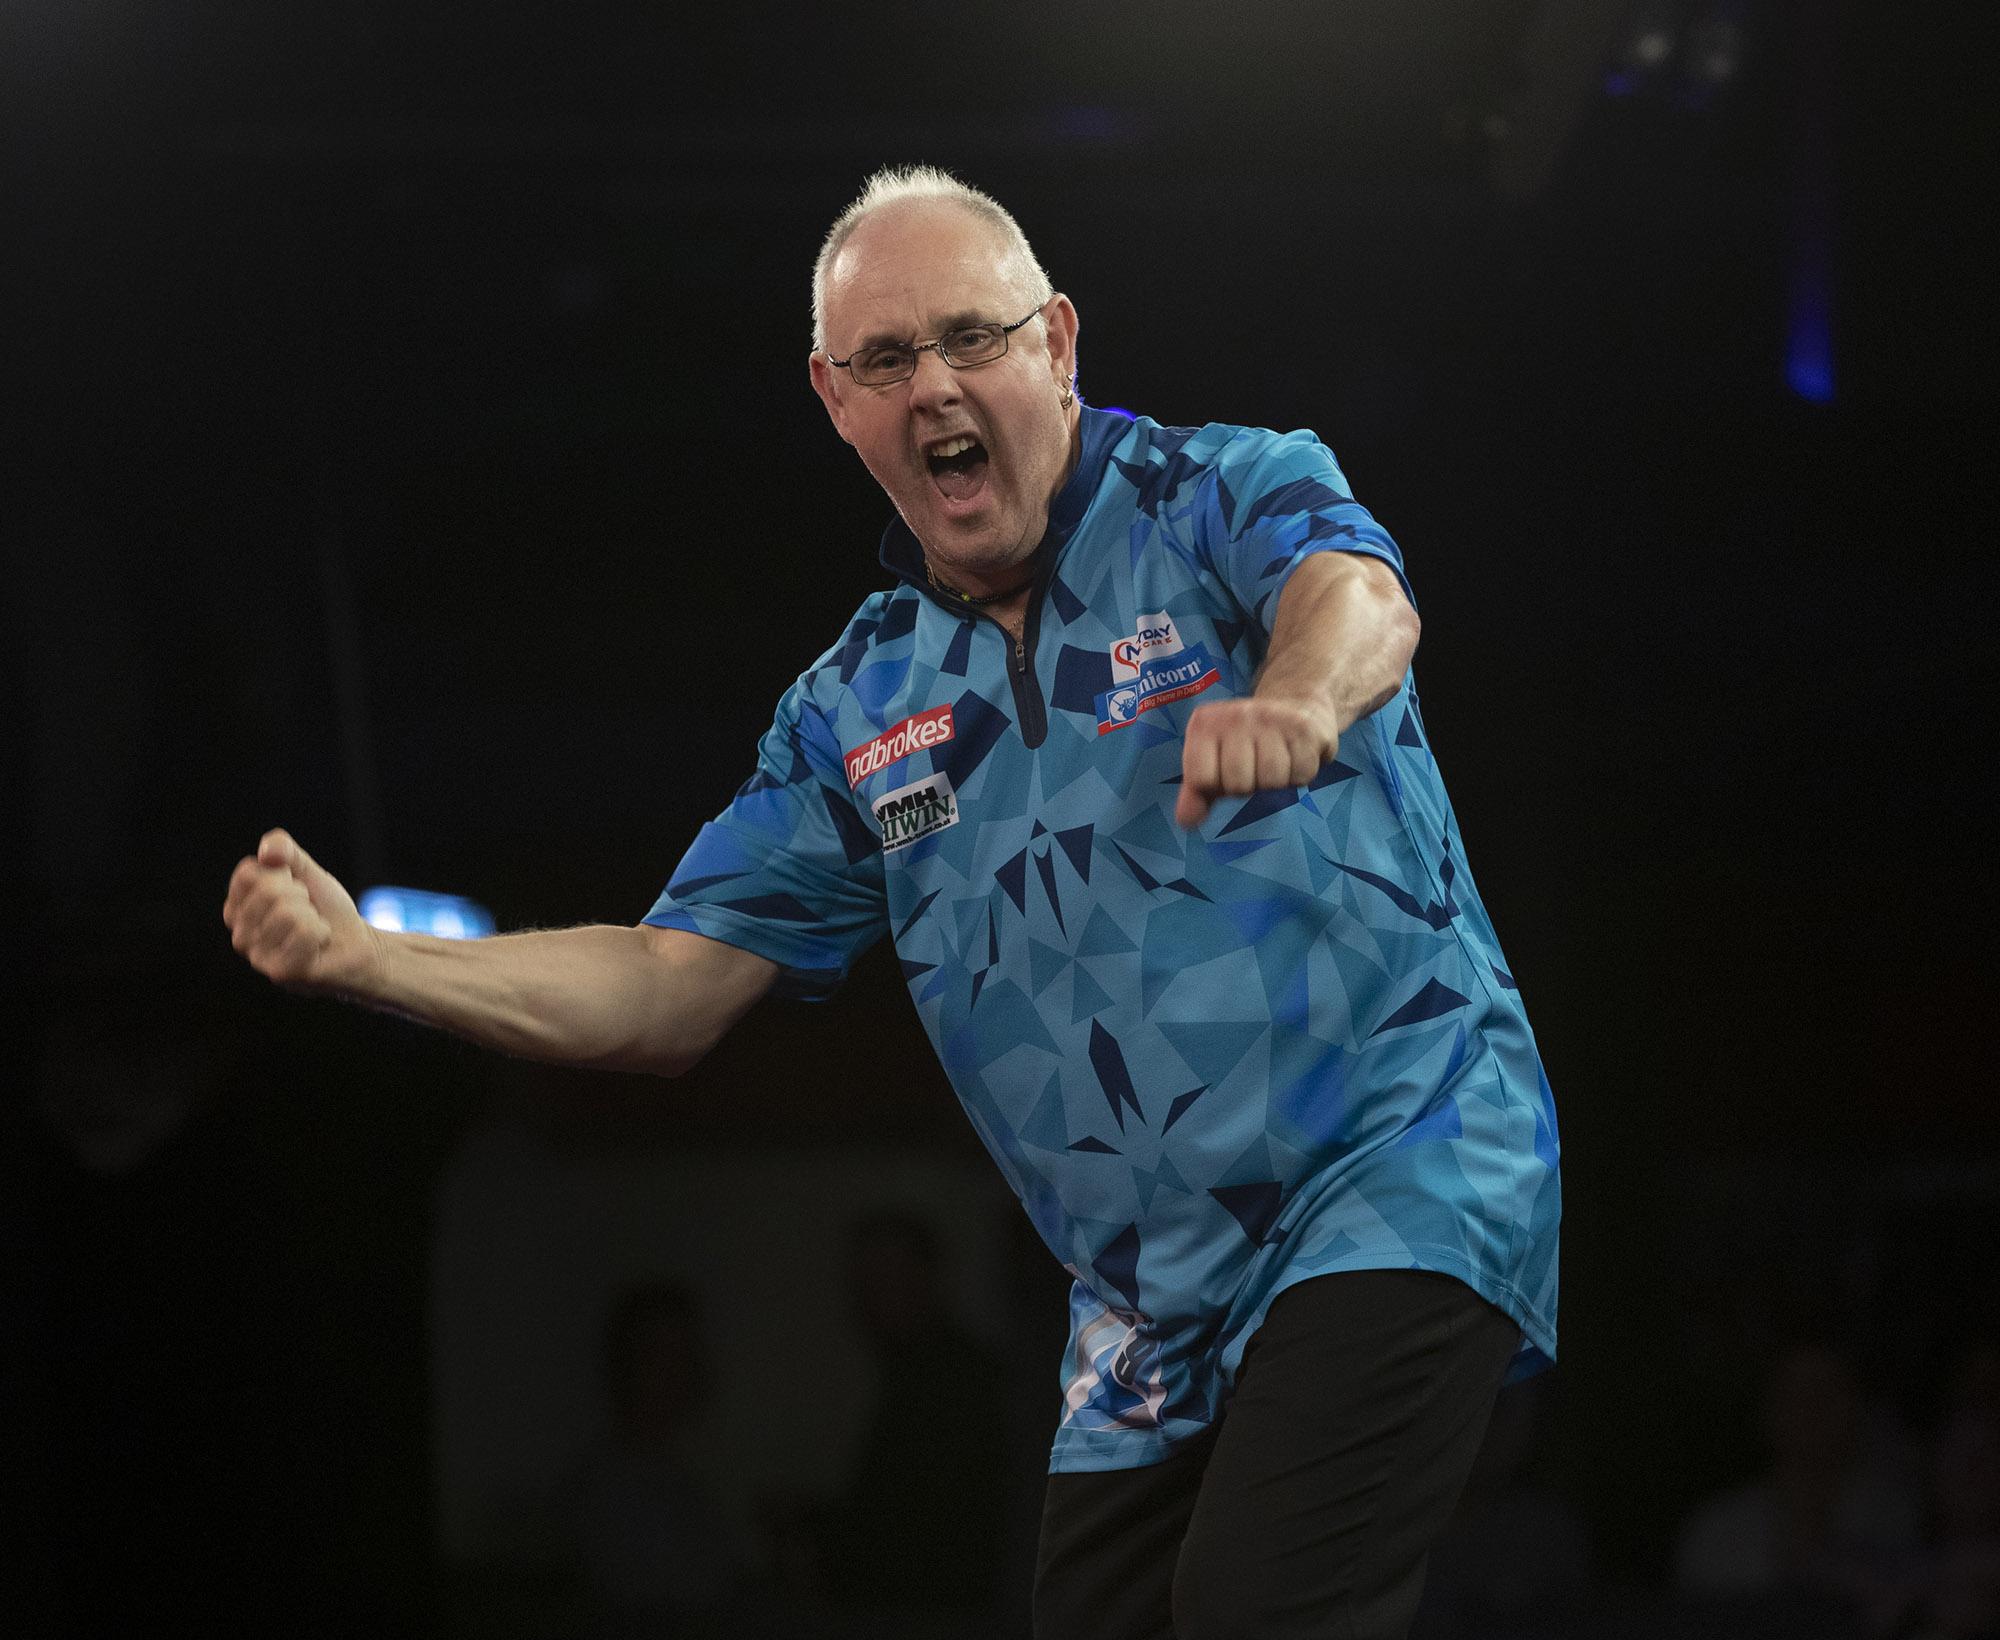 White shocks MvG in round two of European Championship